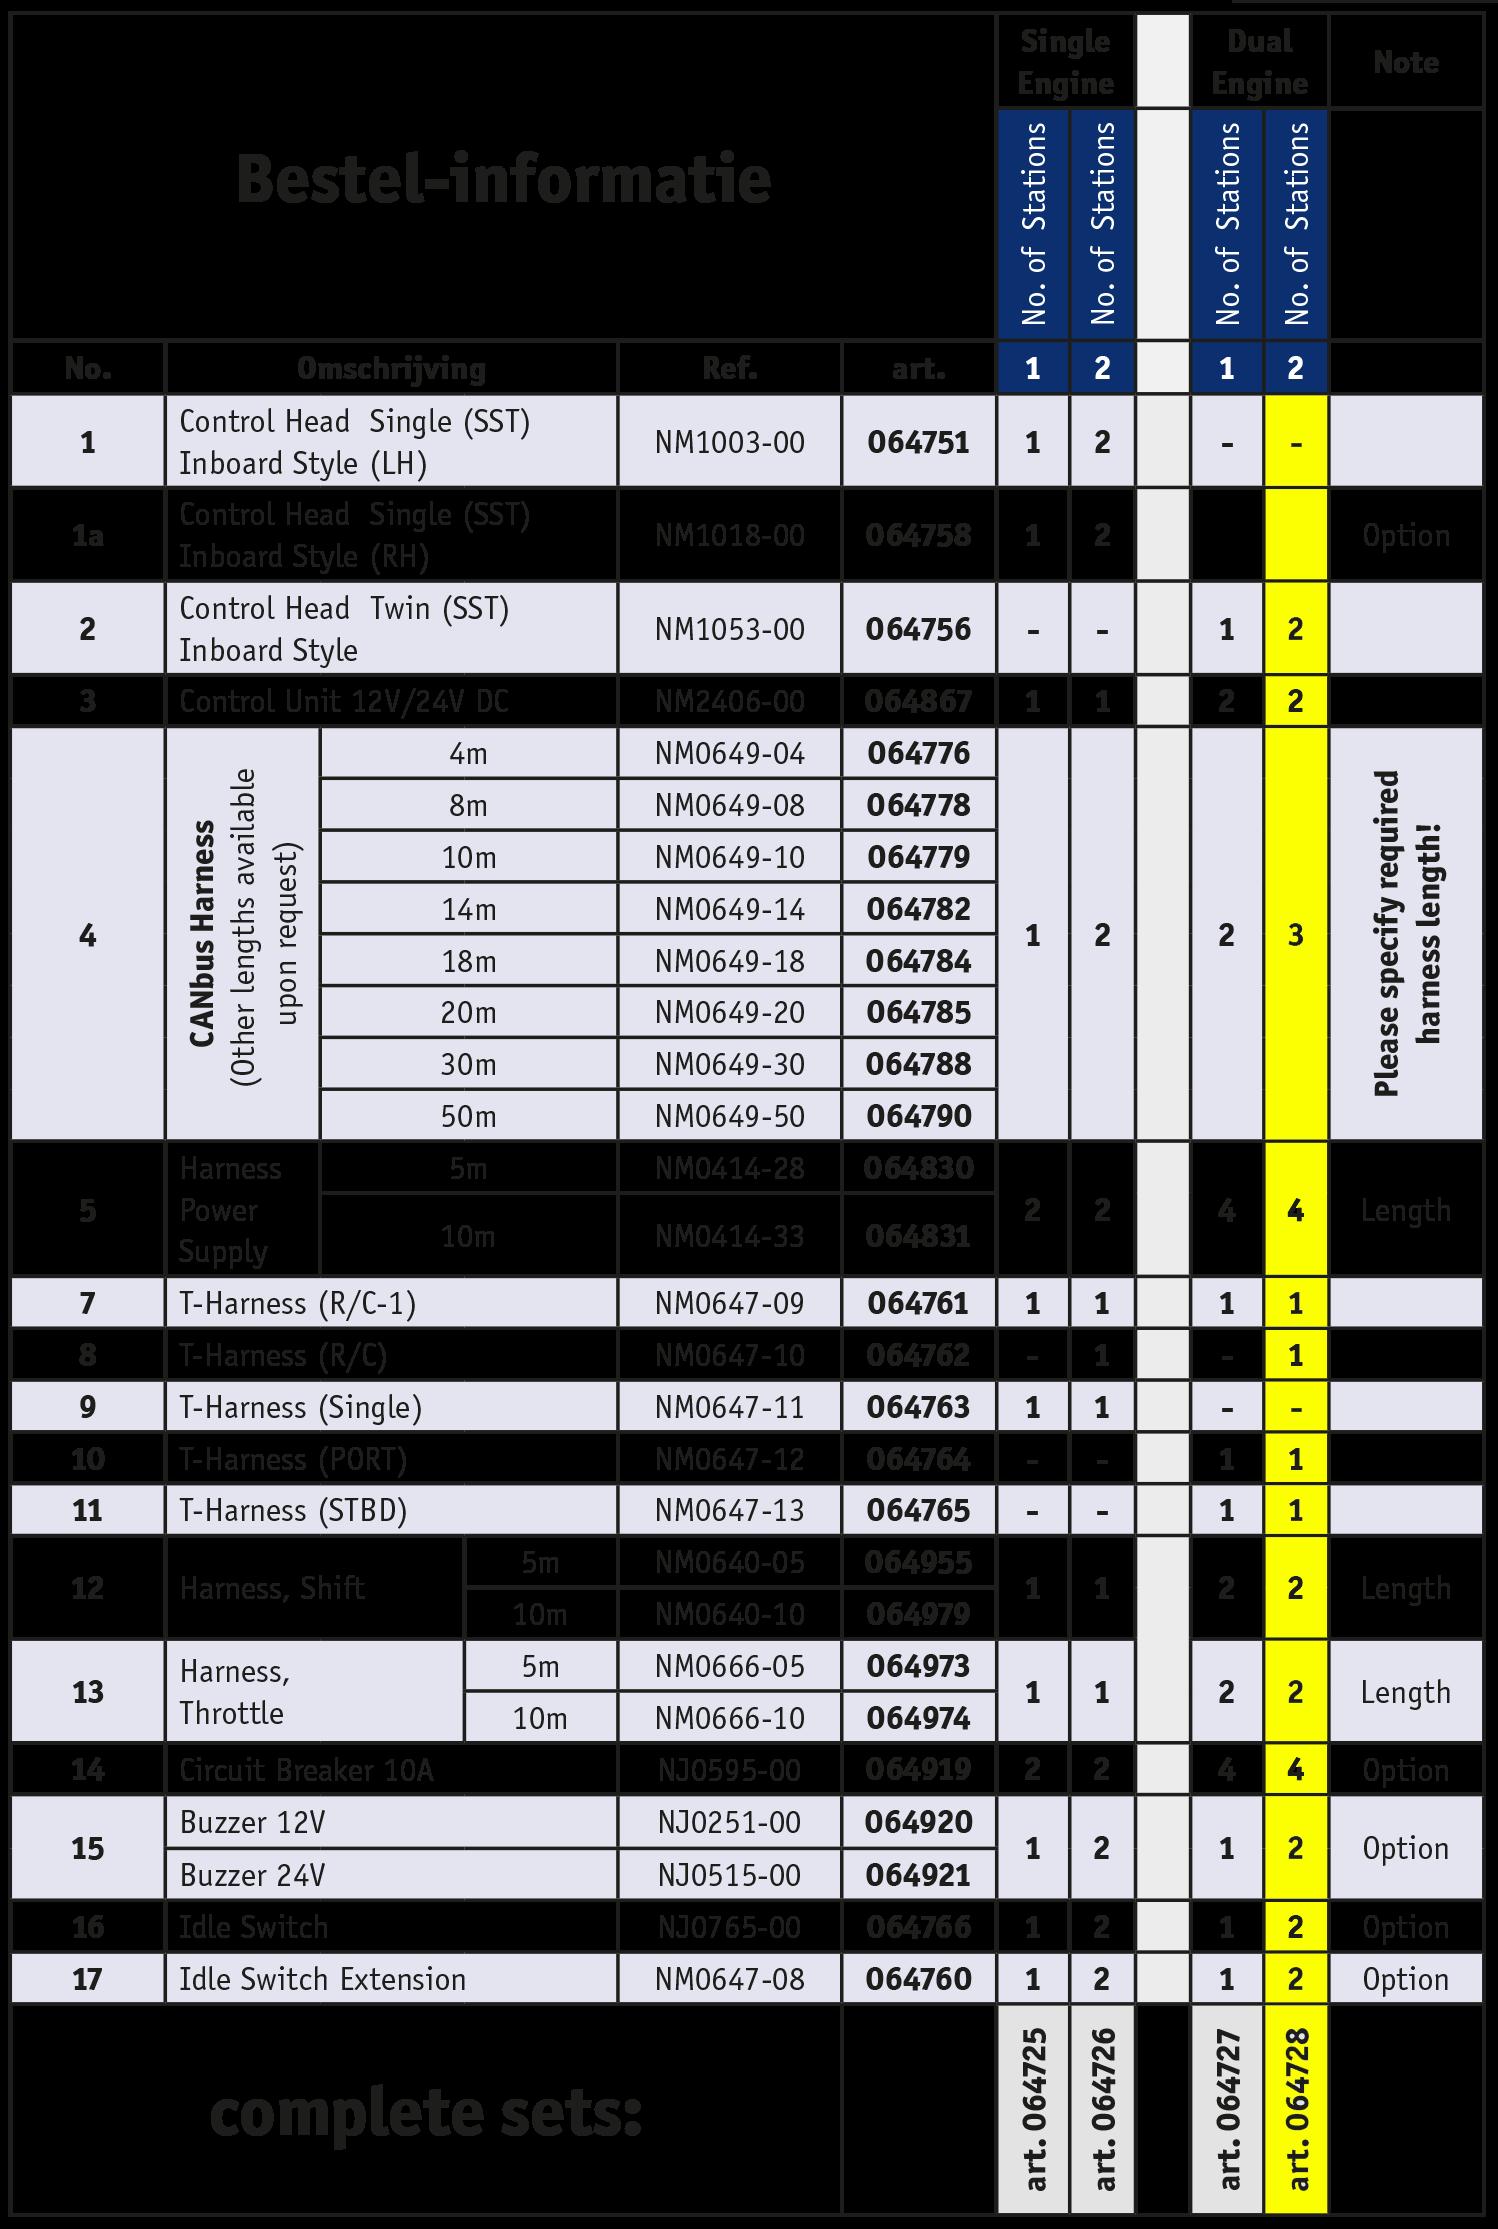 ke-5-canbus-elektronische-motorbedienung-fur-innenborder-2-motoren-2-steuerstande